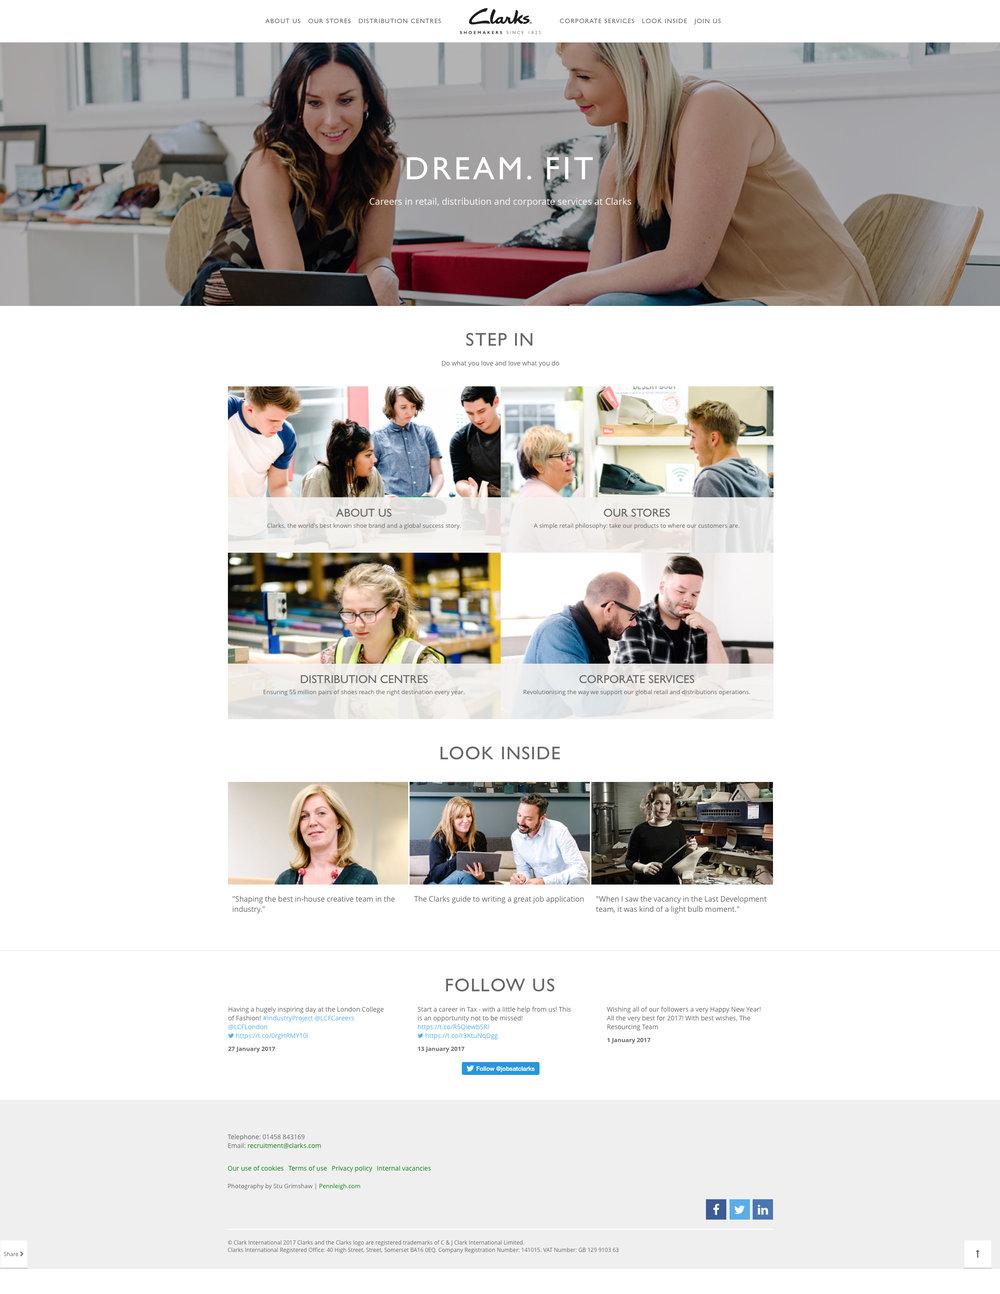 Clarks Shoes Careers Website